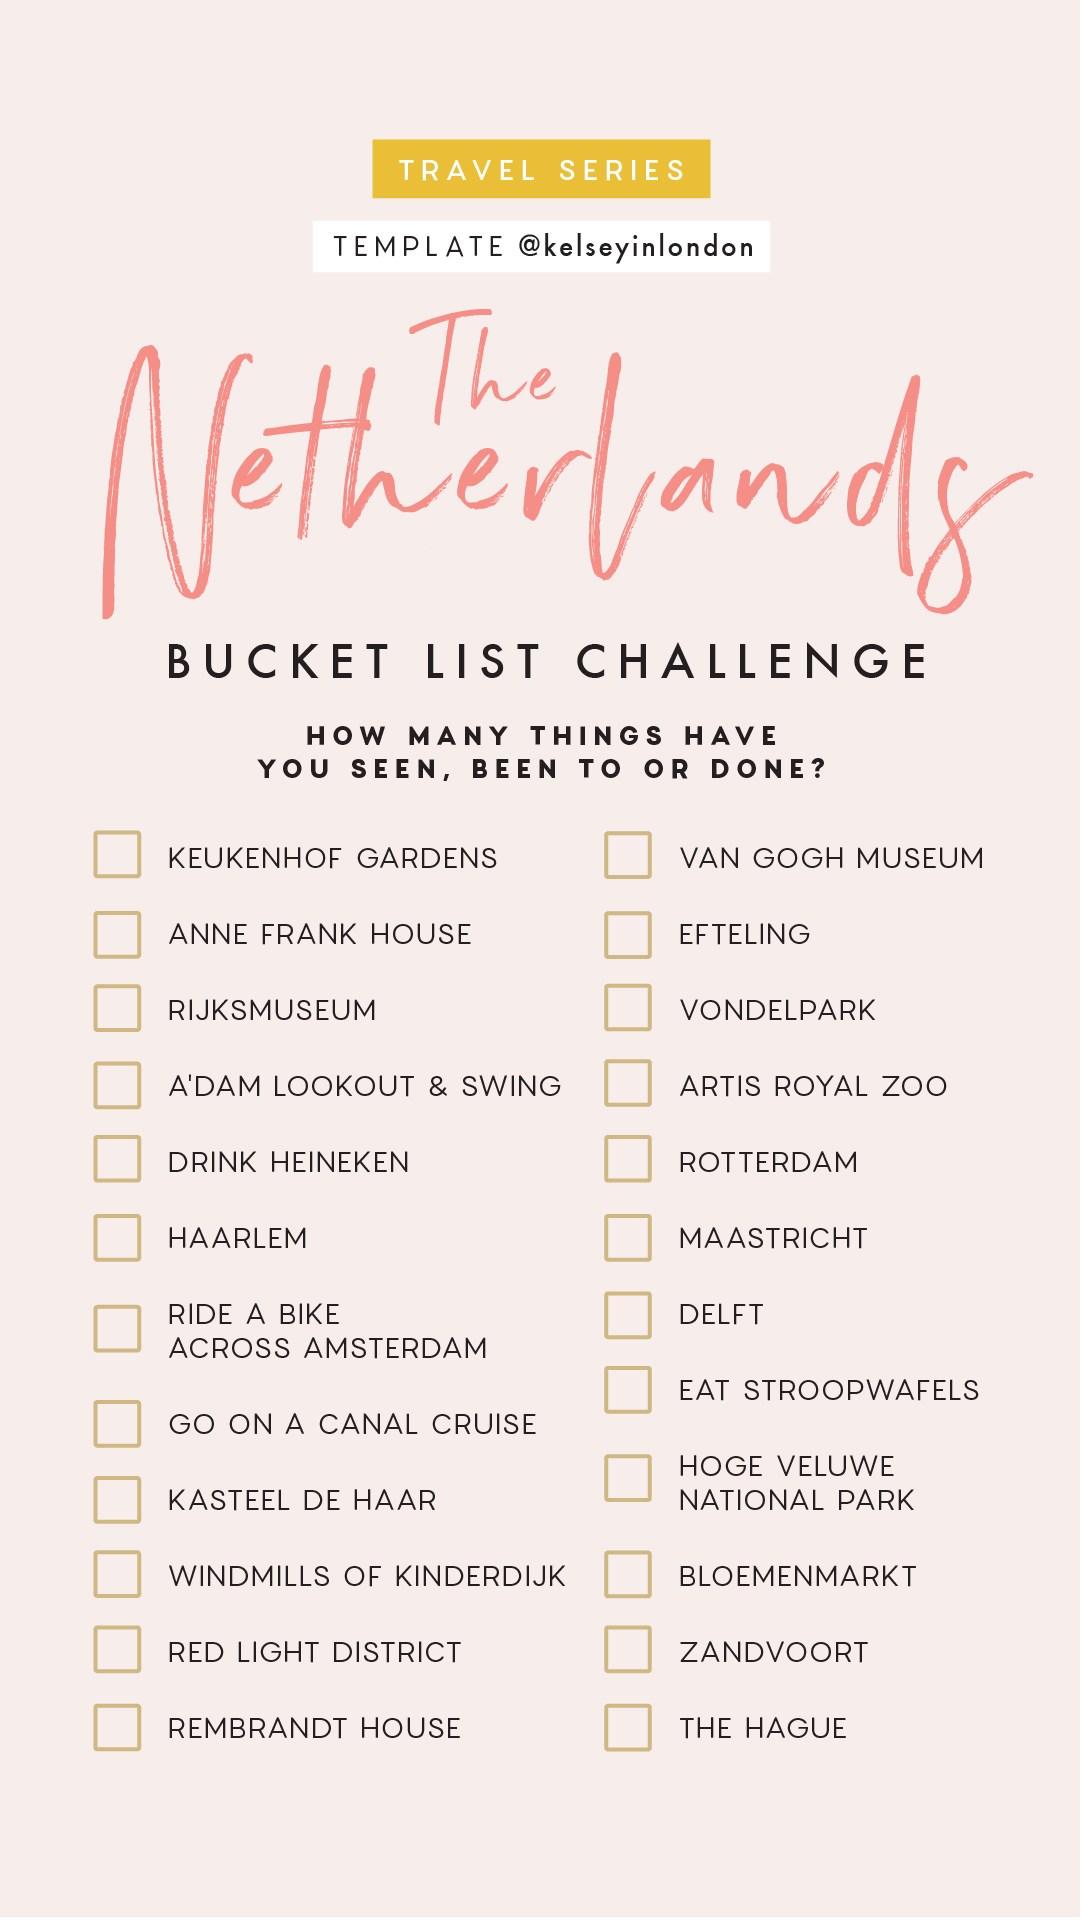 Top things to do in The Netherlands Bucket list Instagram Story Template kelseyinlondon Kelsey Heinrichs What to do in The Netherlands Where to go in The Netherlands top places in The Netherlands